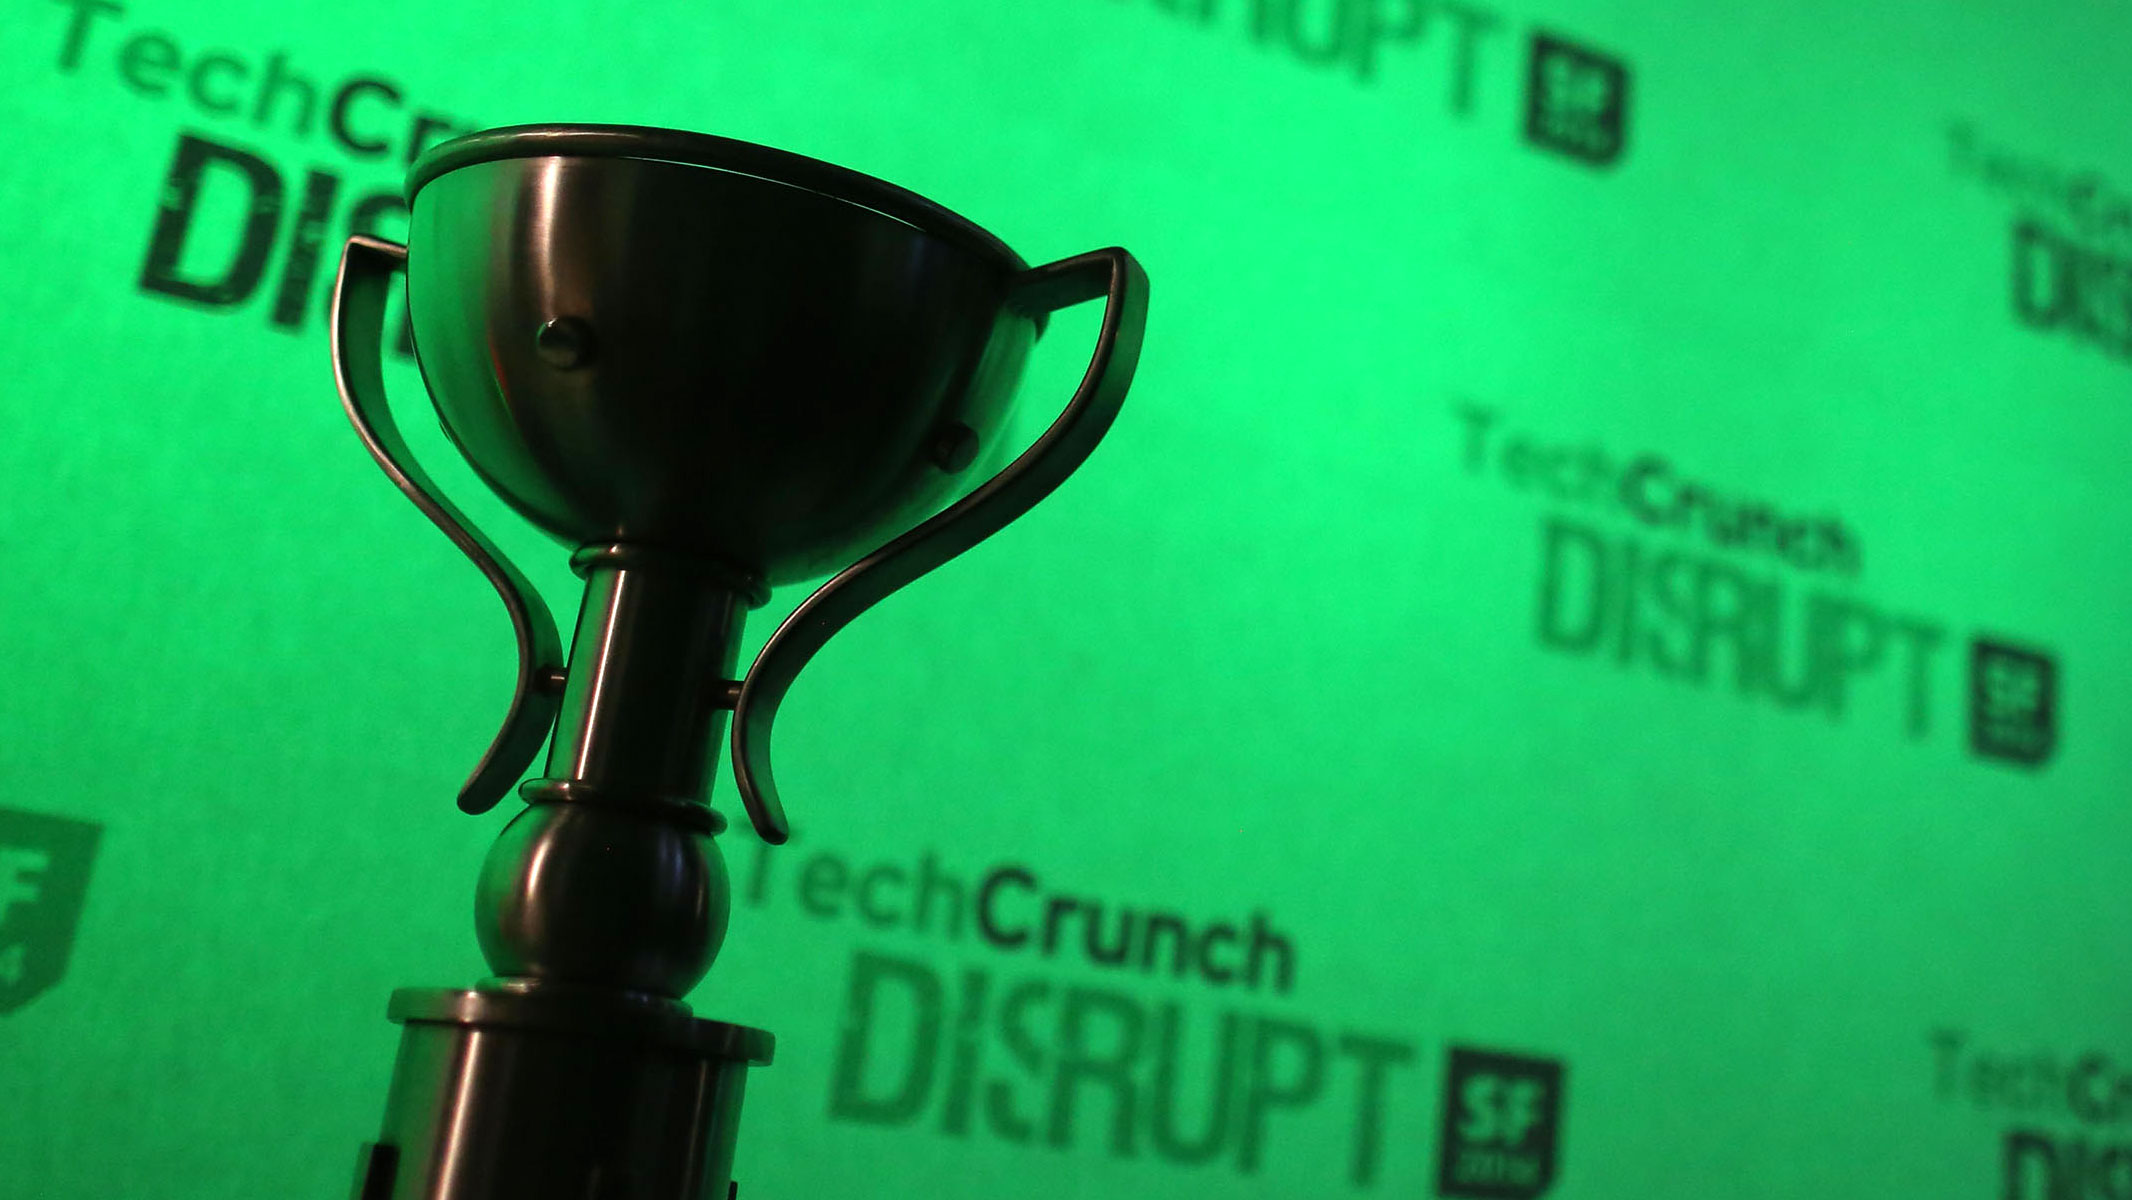 Meet the five finalists at the Disrupt Berlin Startup Battlefield